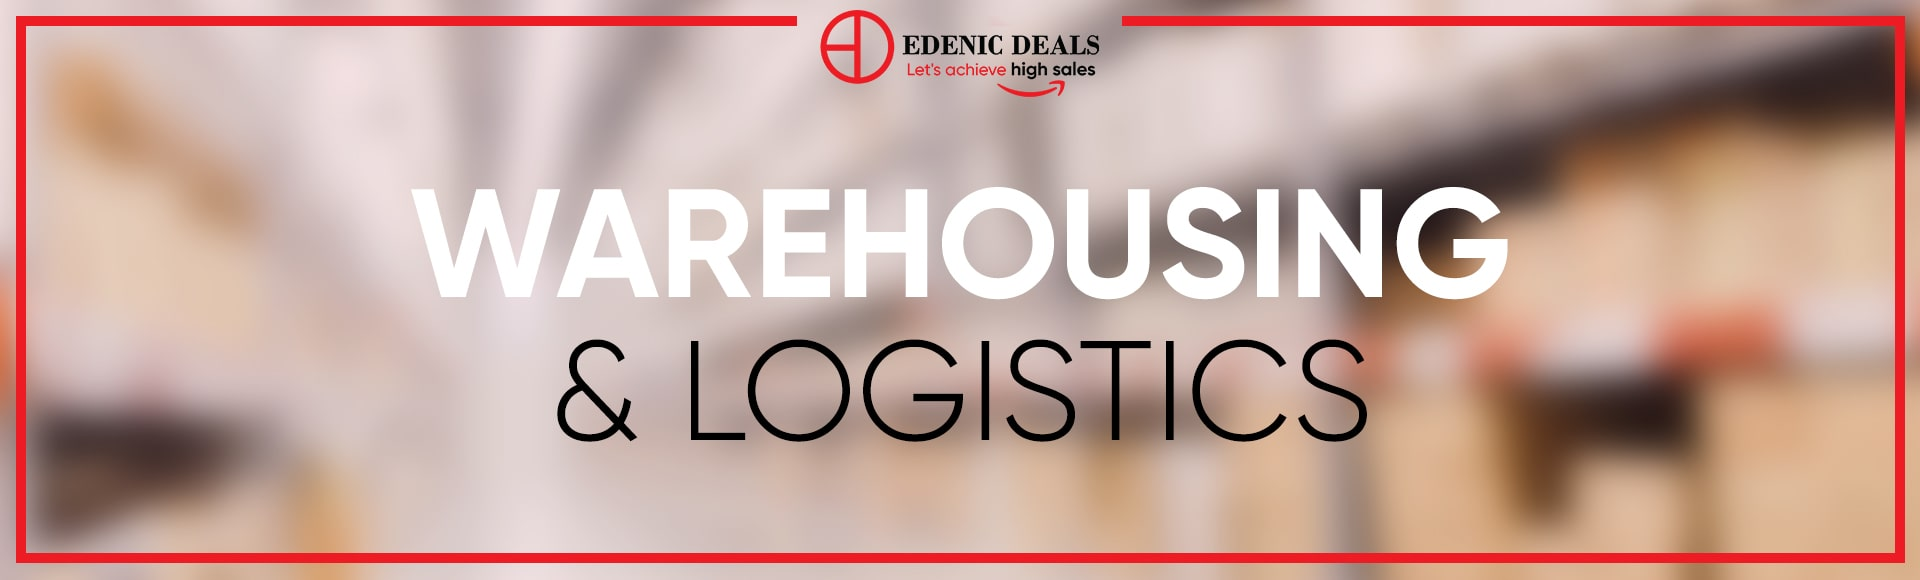 Edenic Deals warehousing and logistics